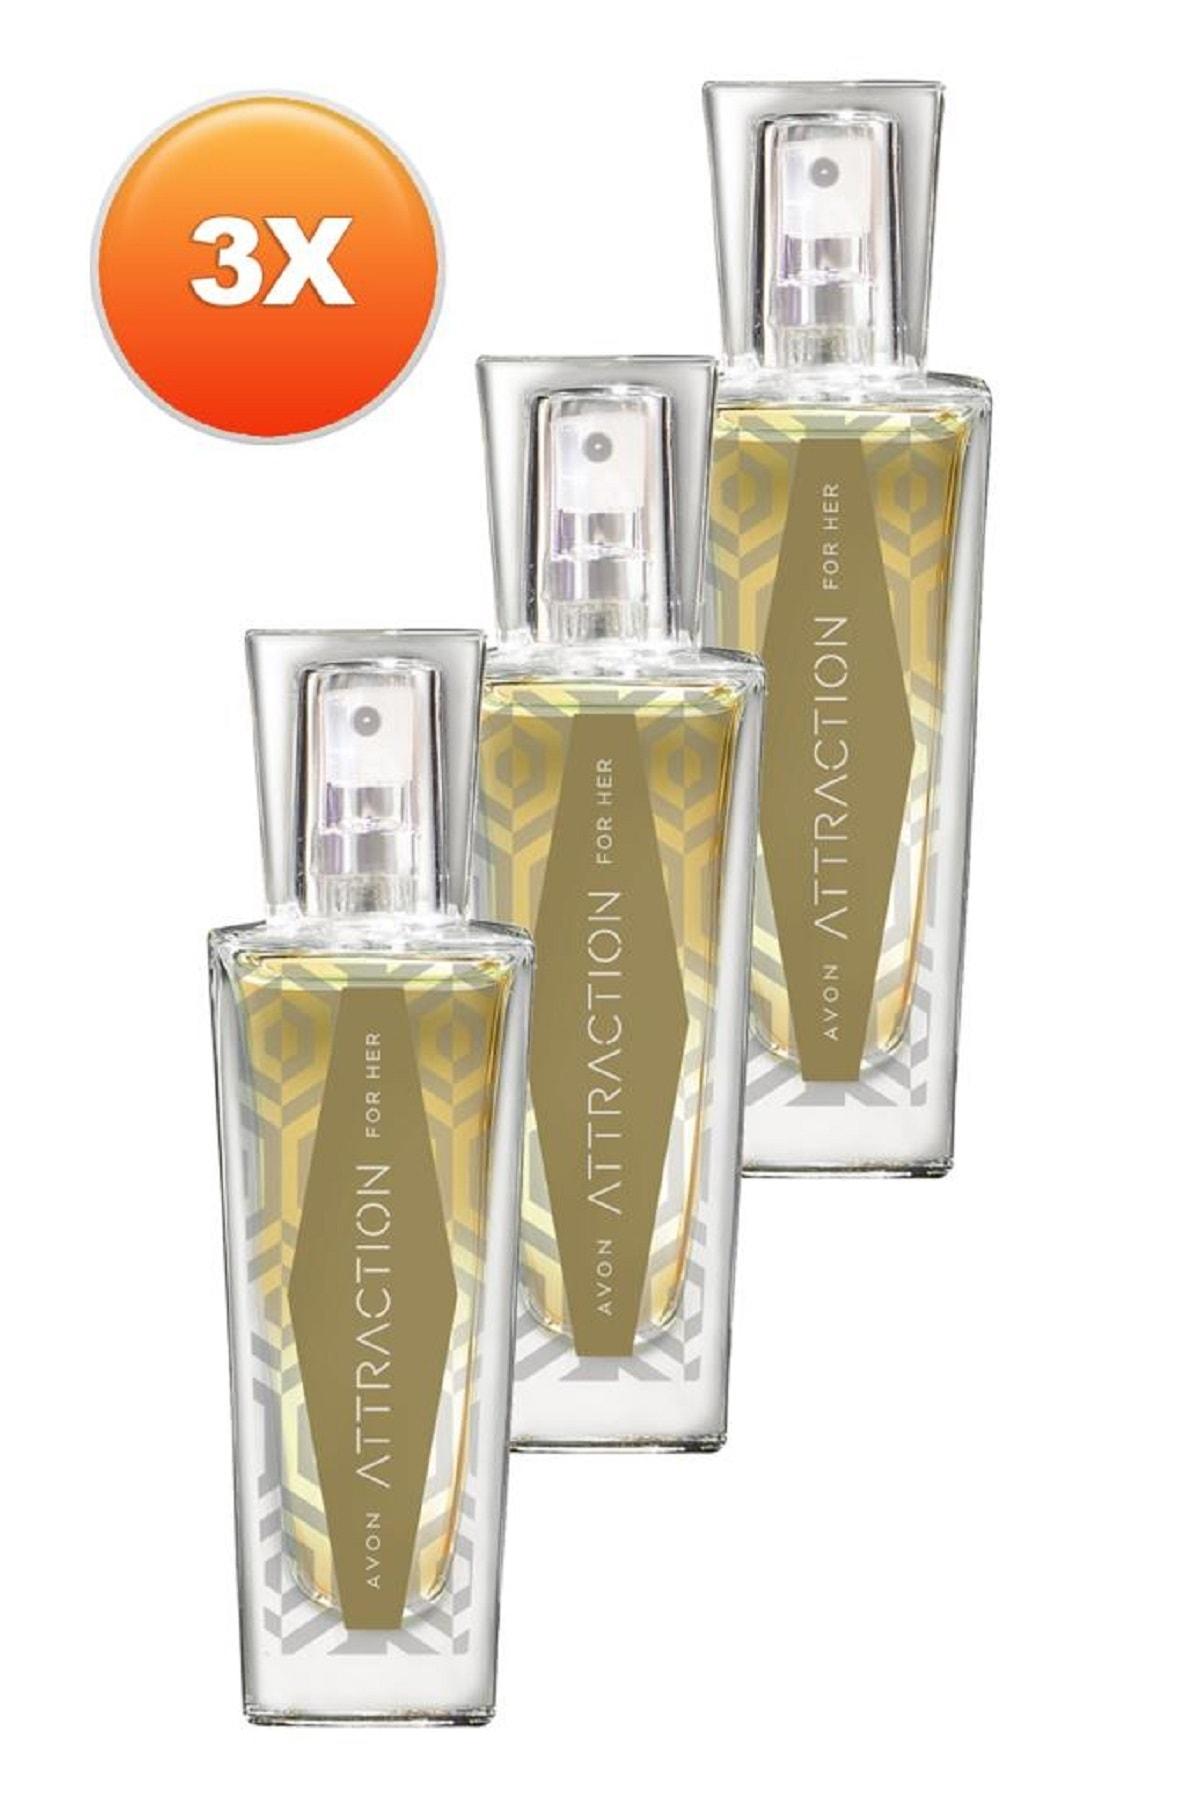 Avon Attraction Kadın Parfüm Edp 30 ml 3'lü Set 5050000103428 0